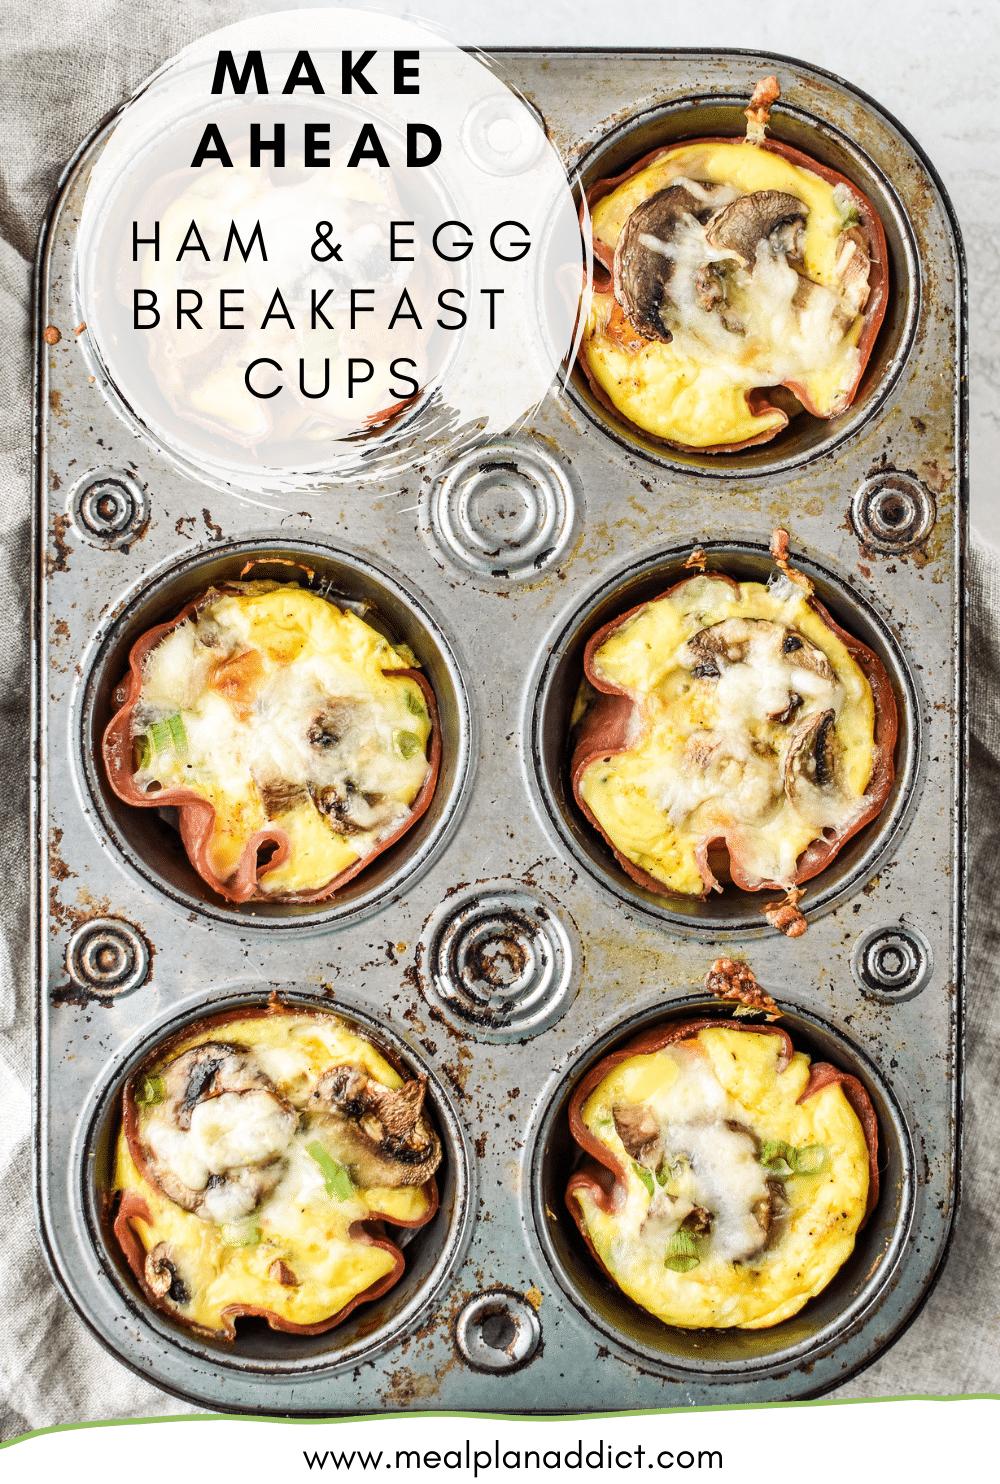 Make Ahead Ham & Egg Breakfast Cups